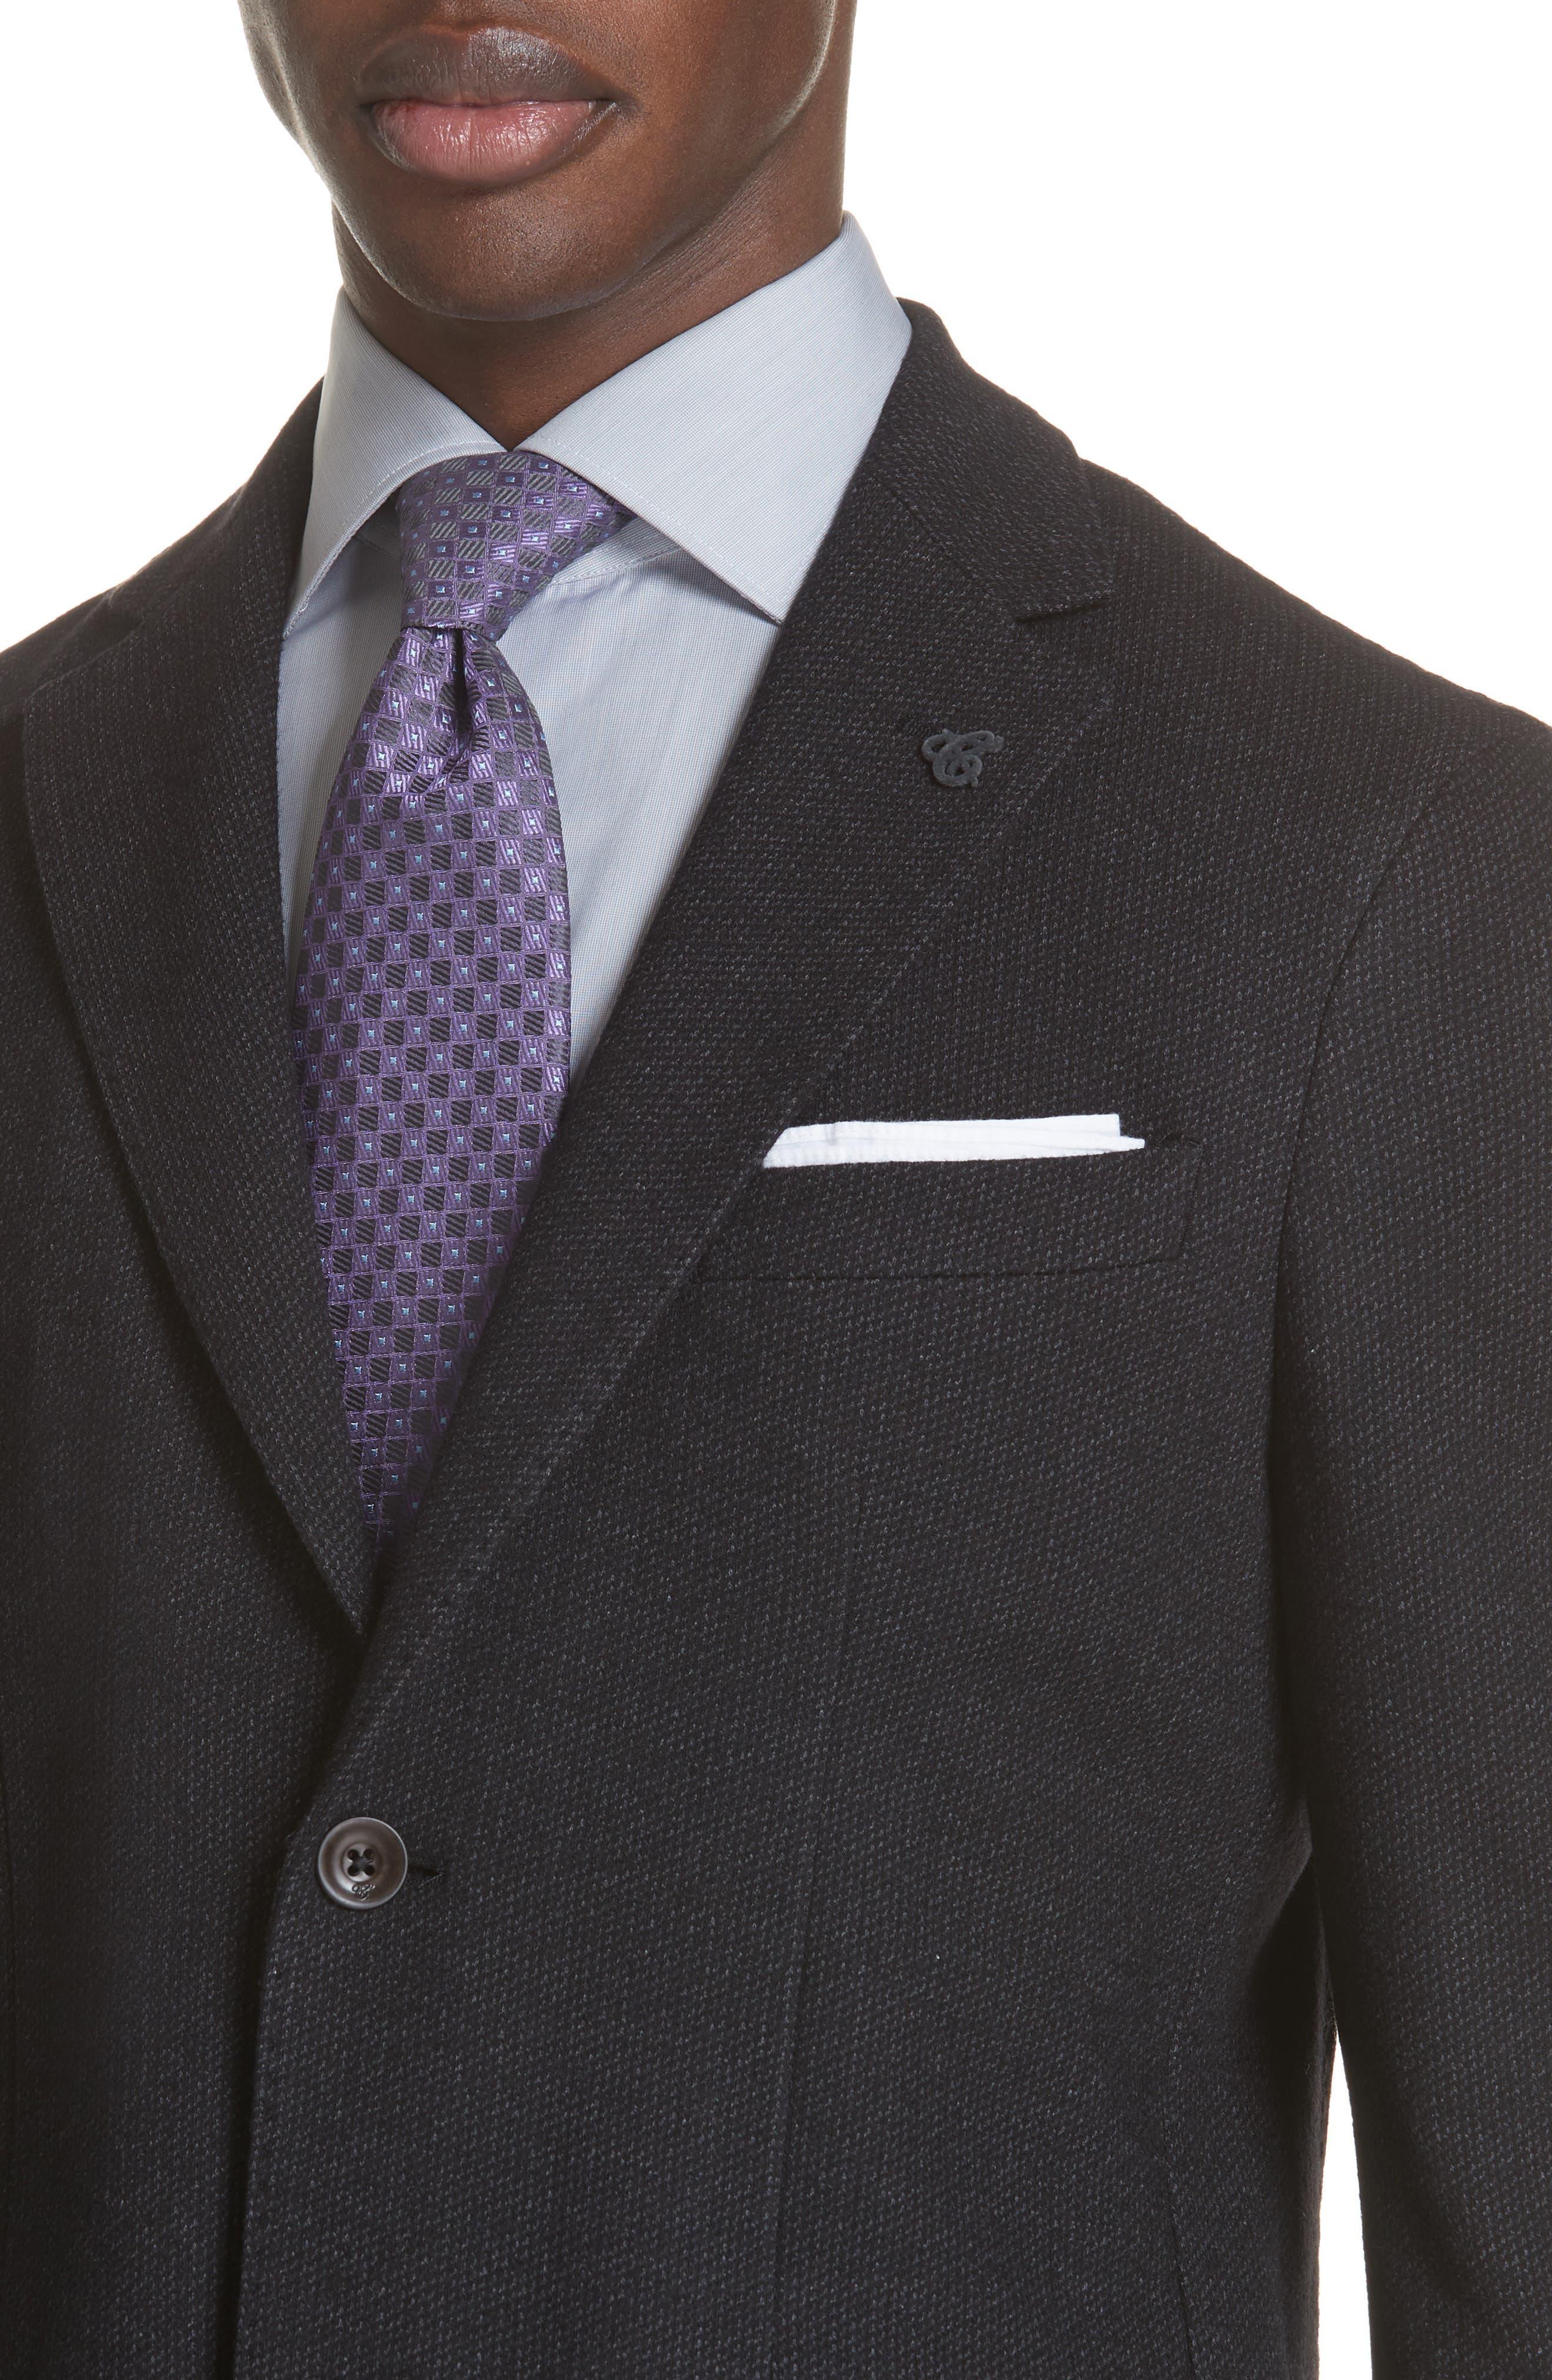 Slim Fit Wool & Cotton Blazer,                             Alternate thumbnail 4, color,                             020